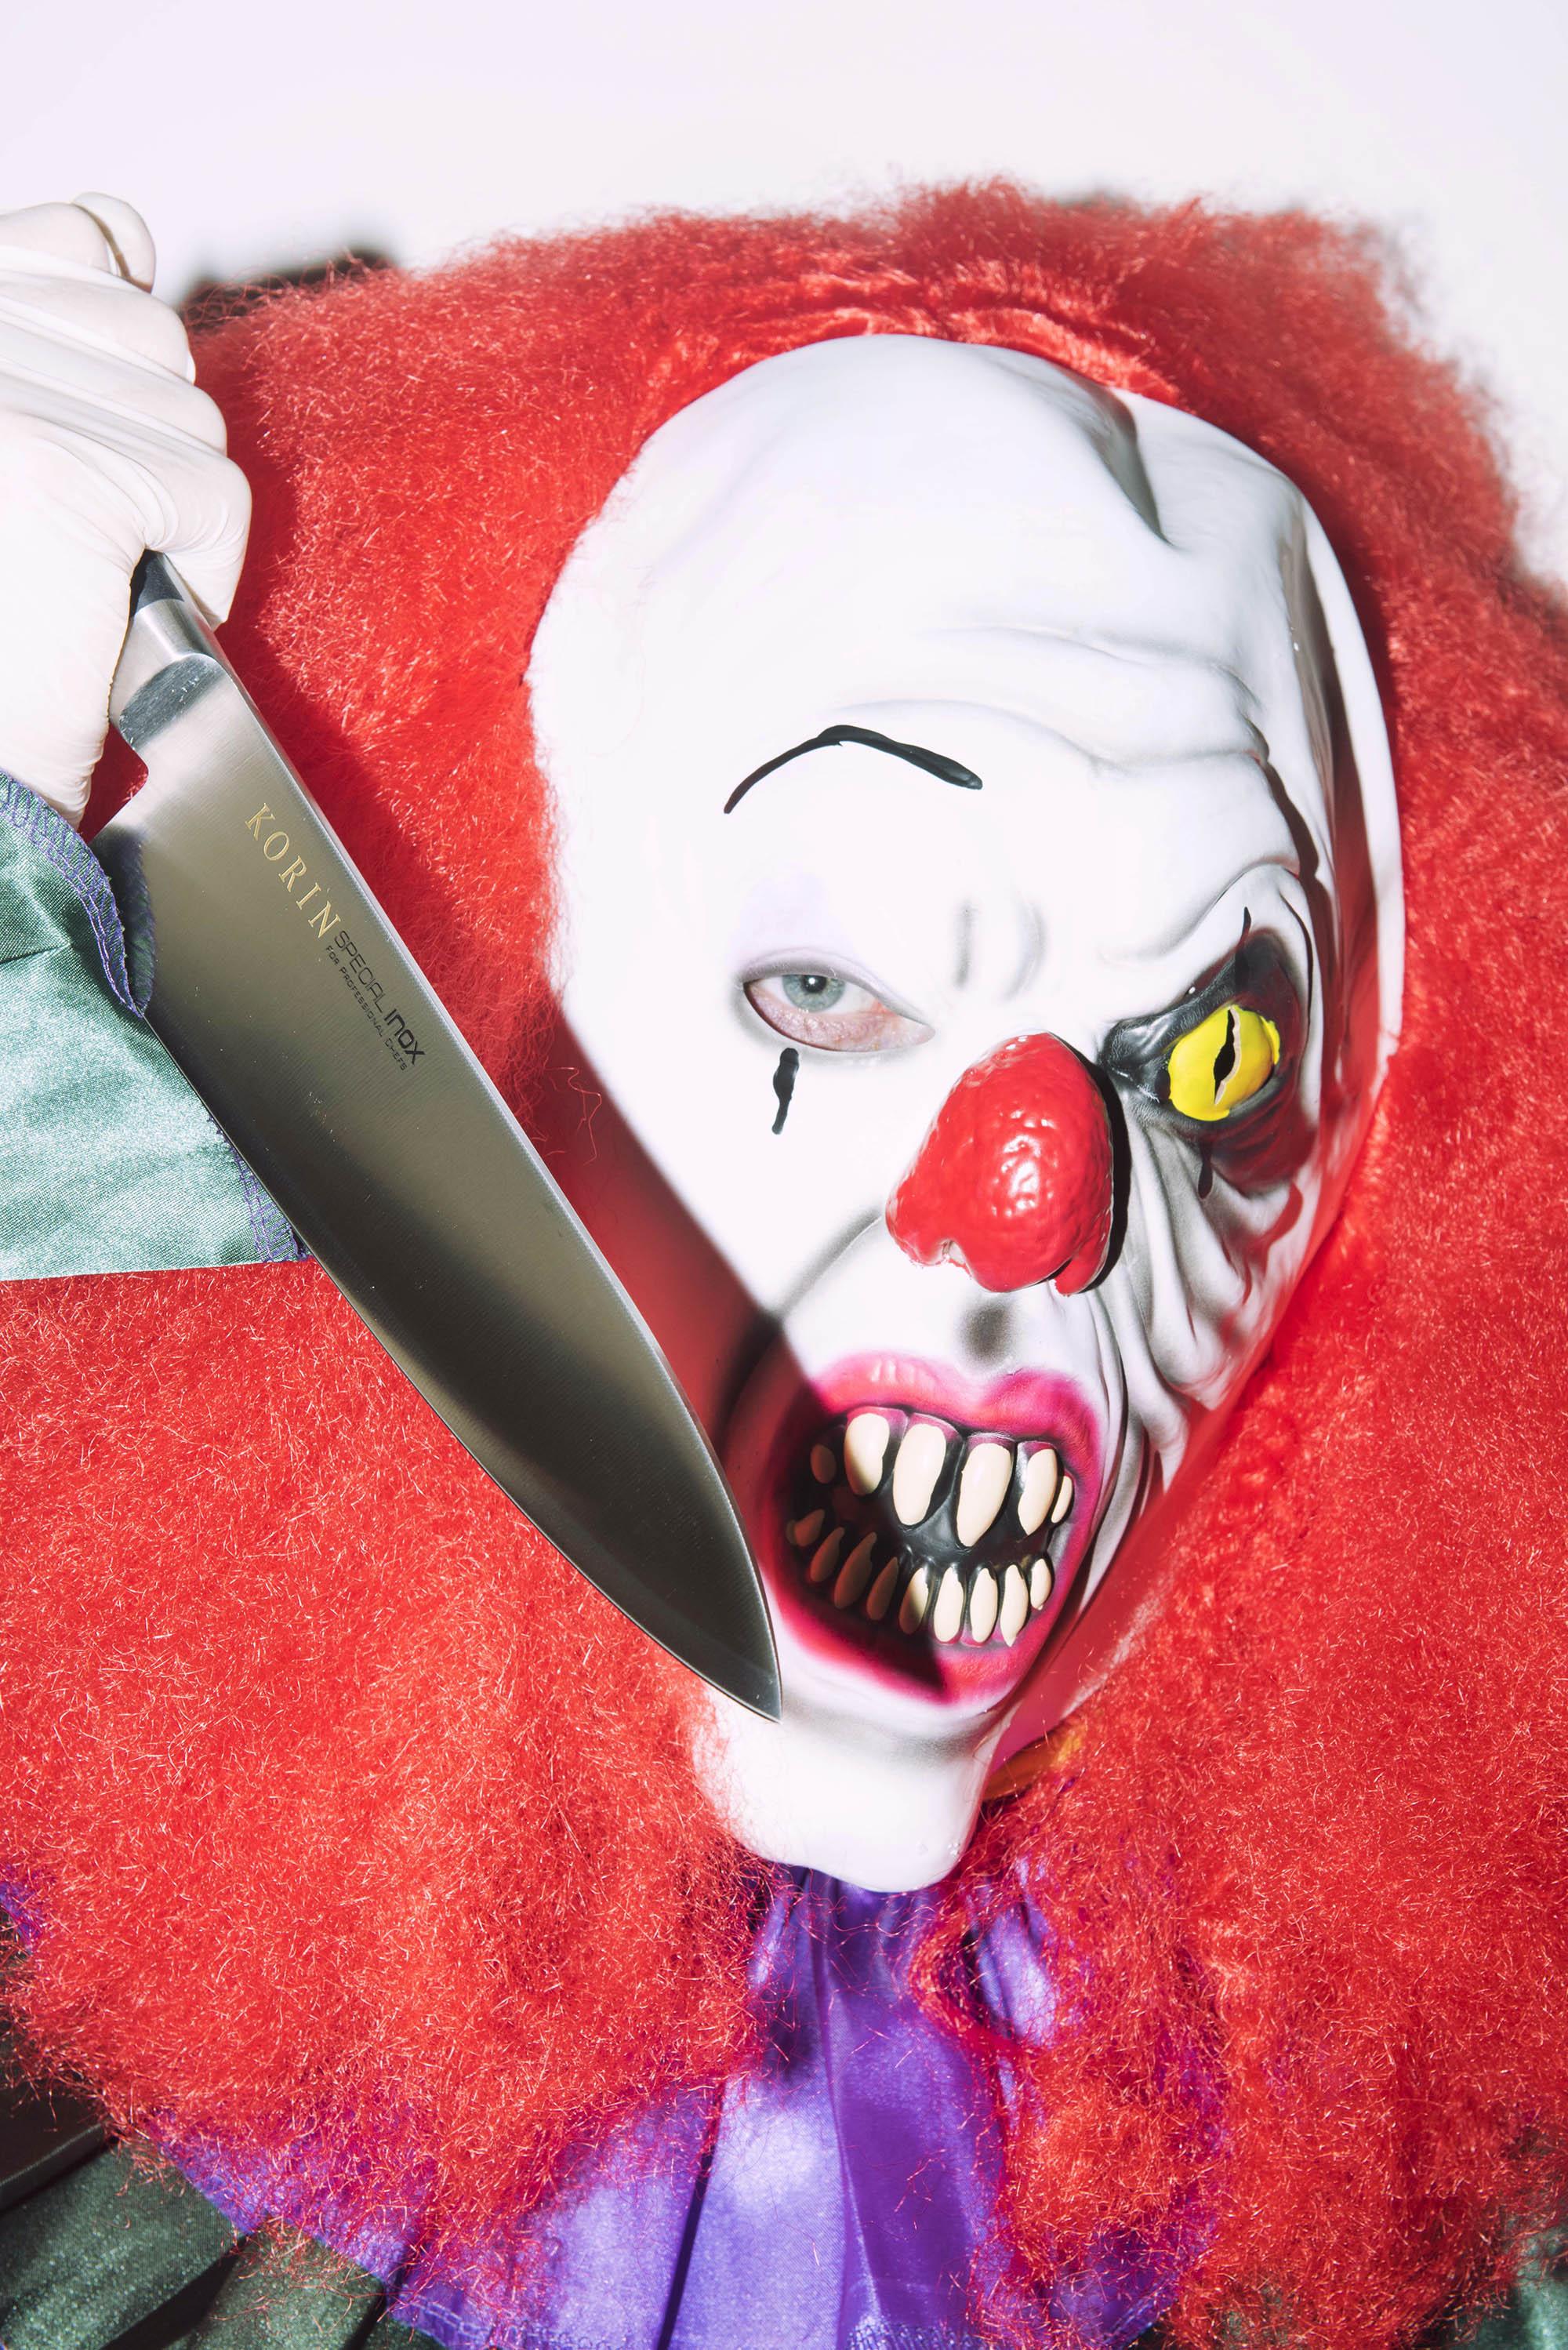 clown-knives-shoot-3